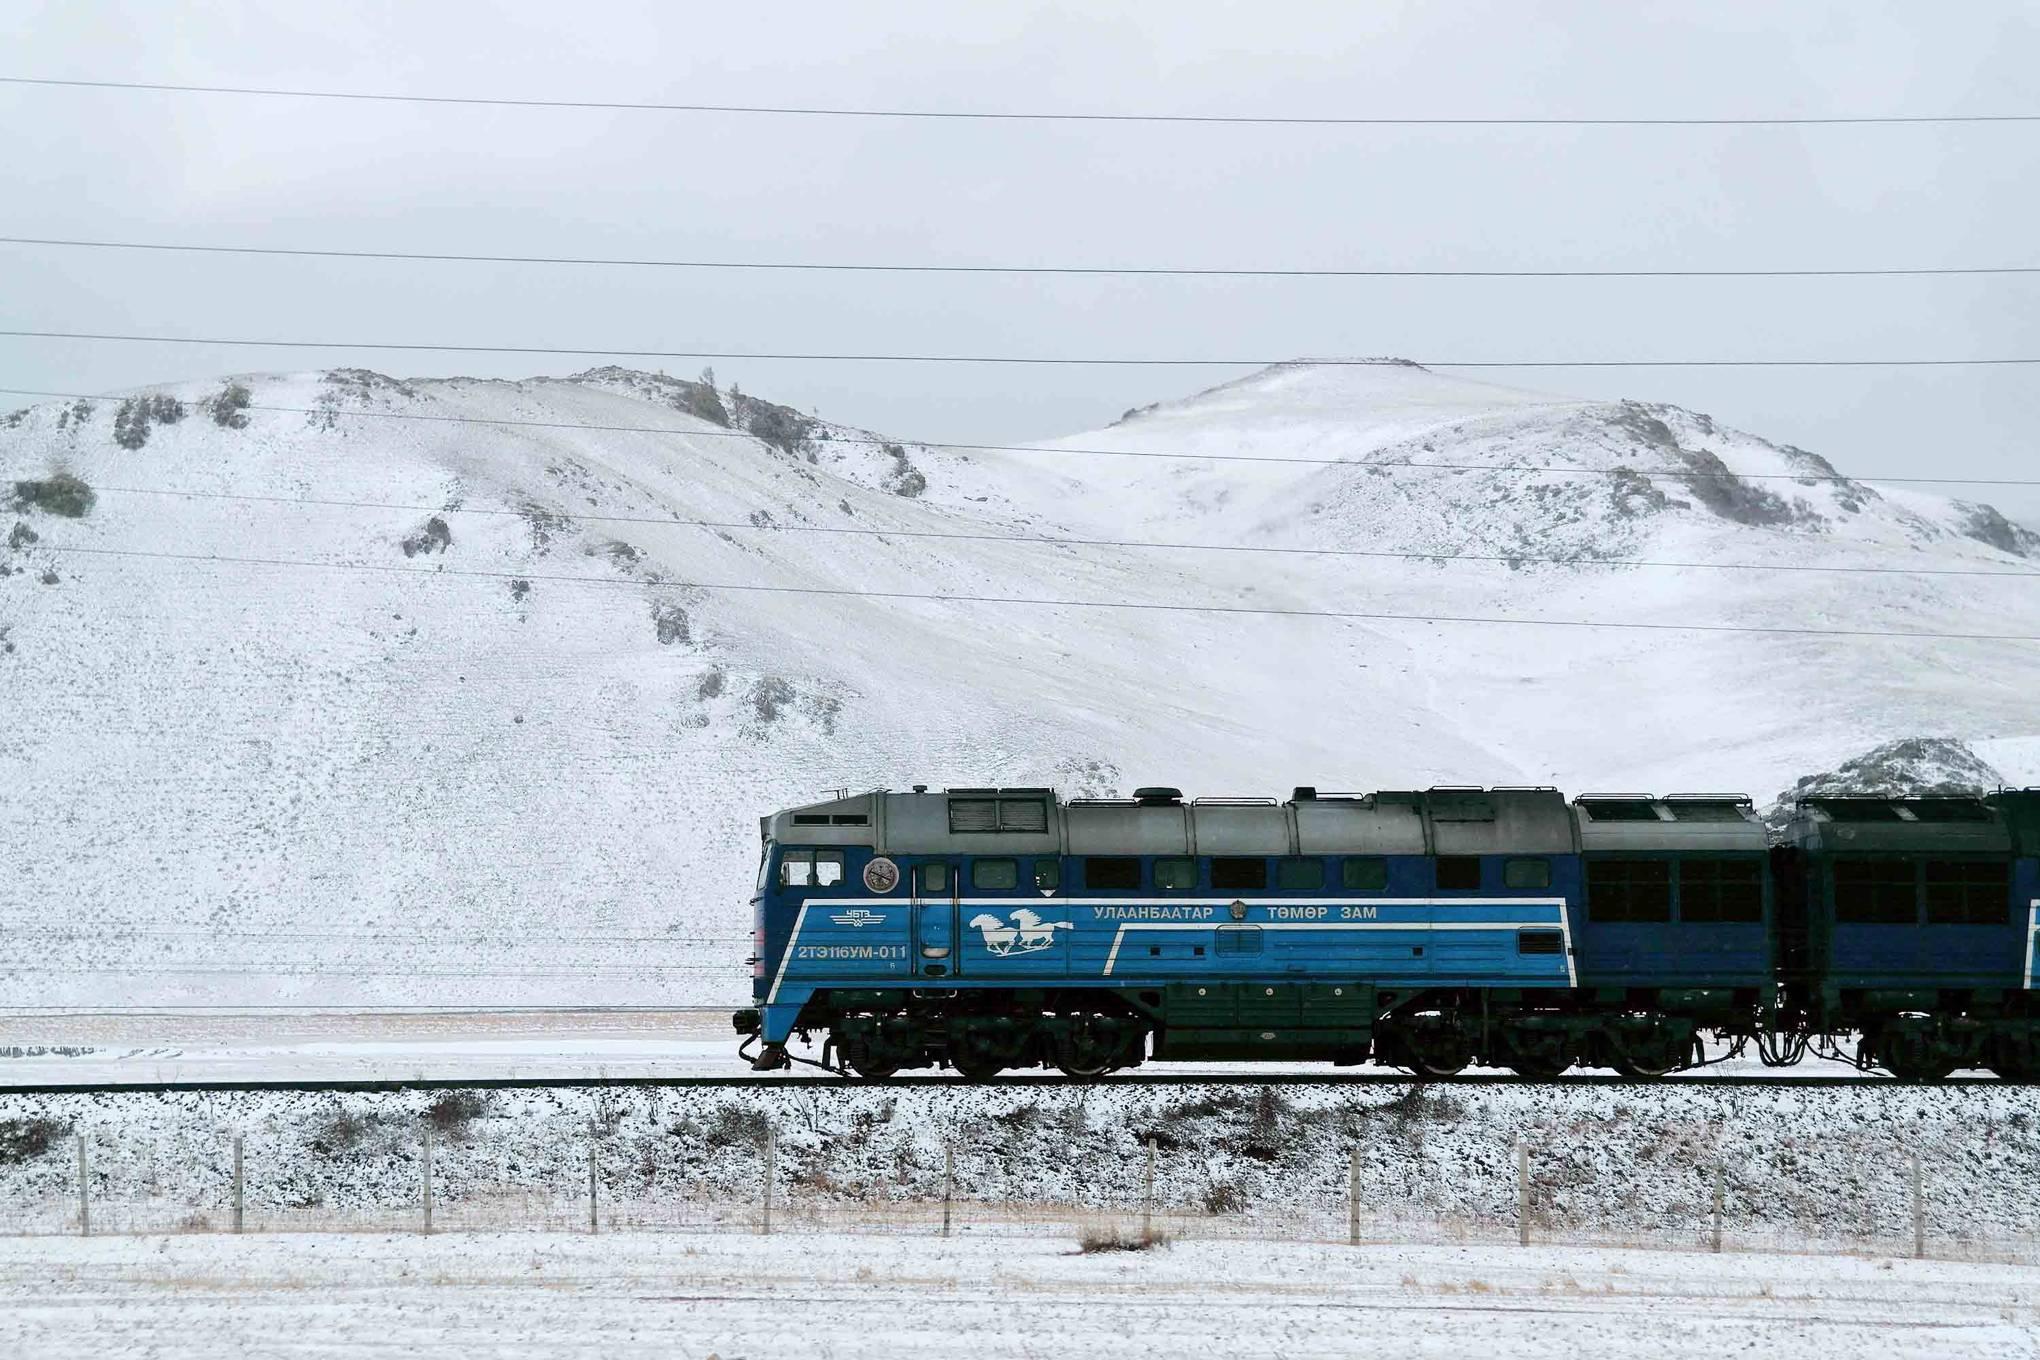 Katie Glass on the Trans-Mongolian railway